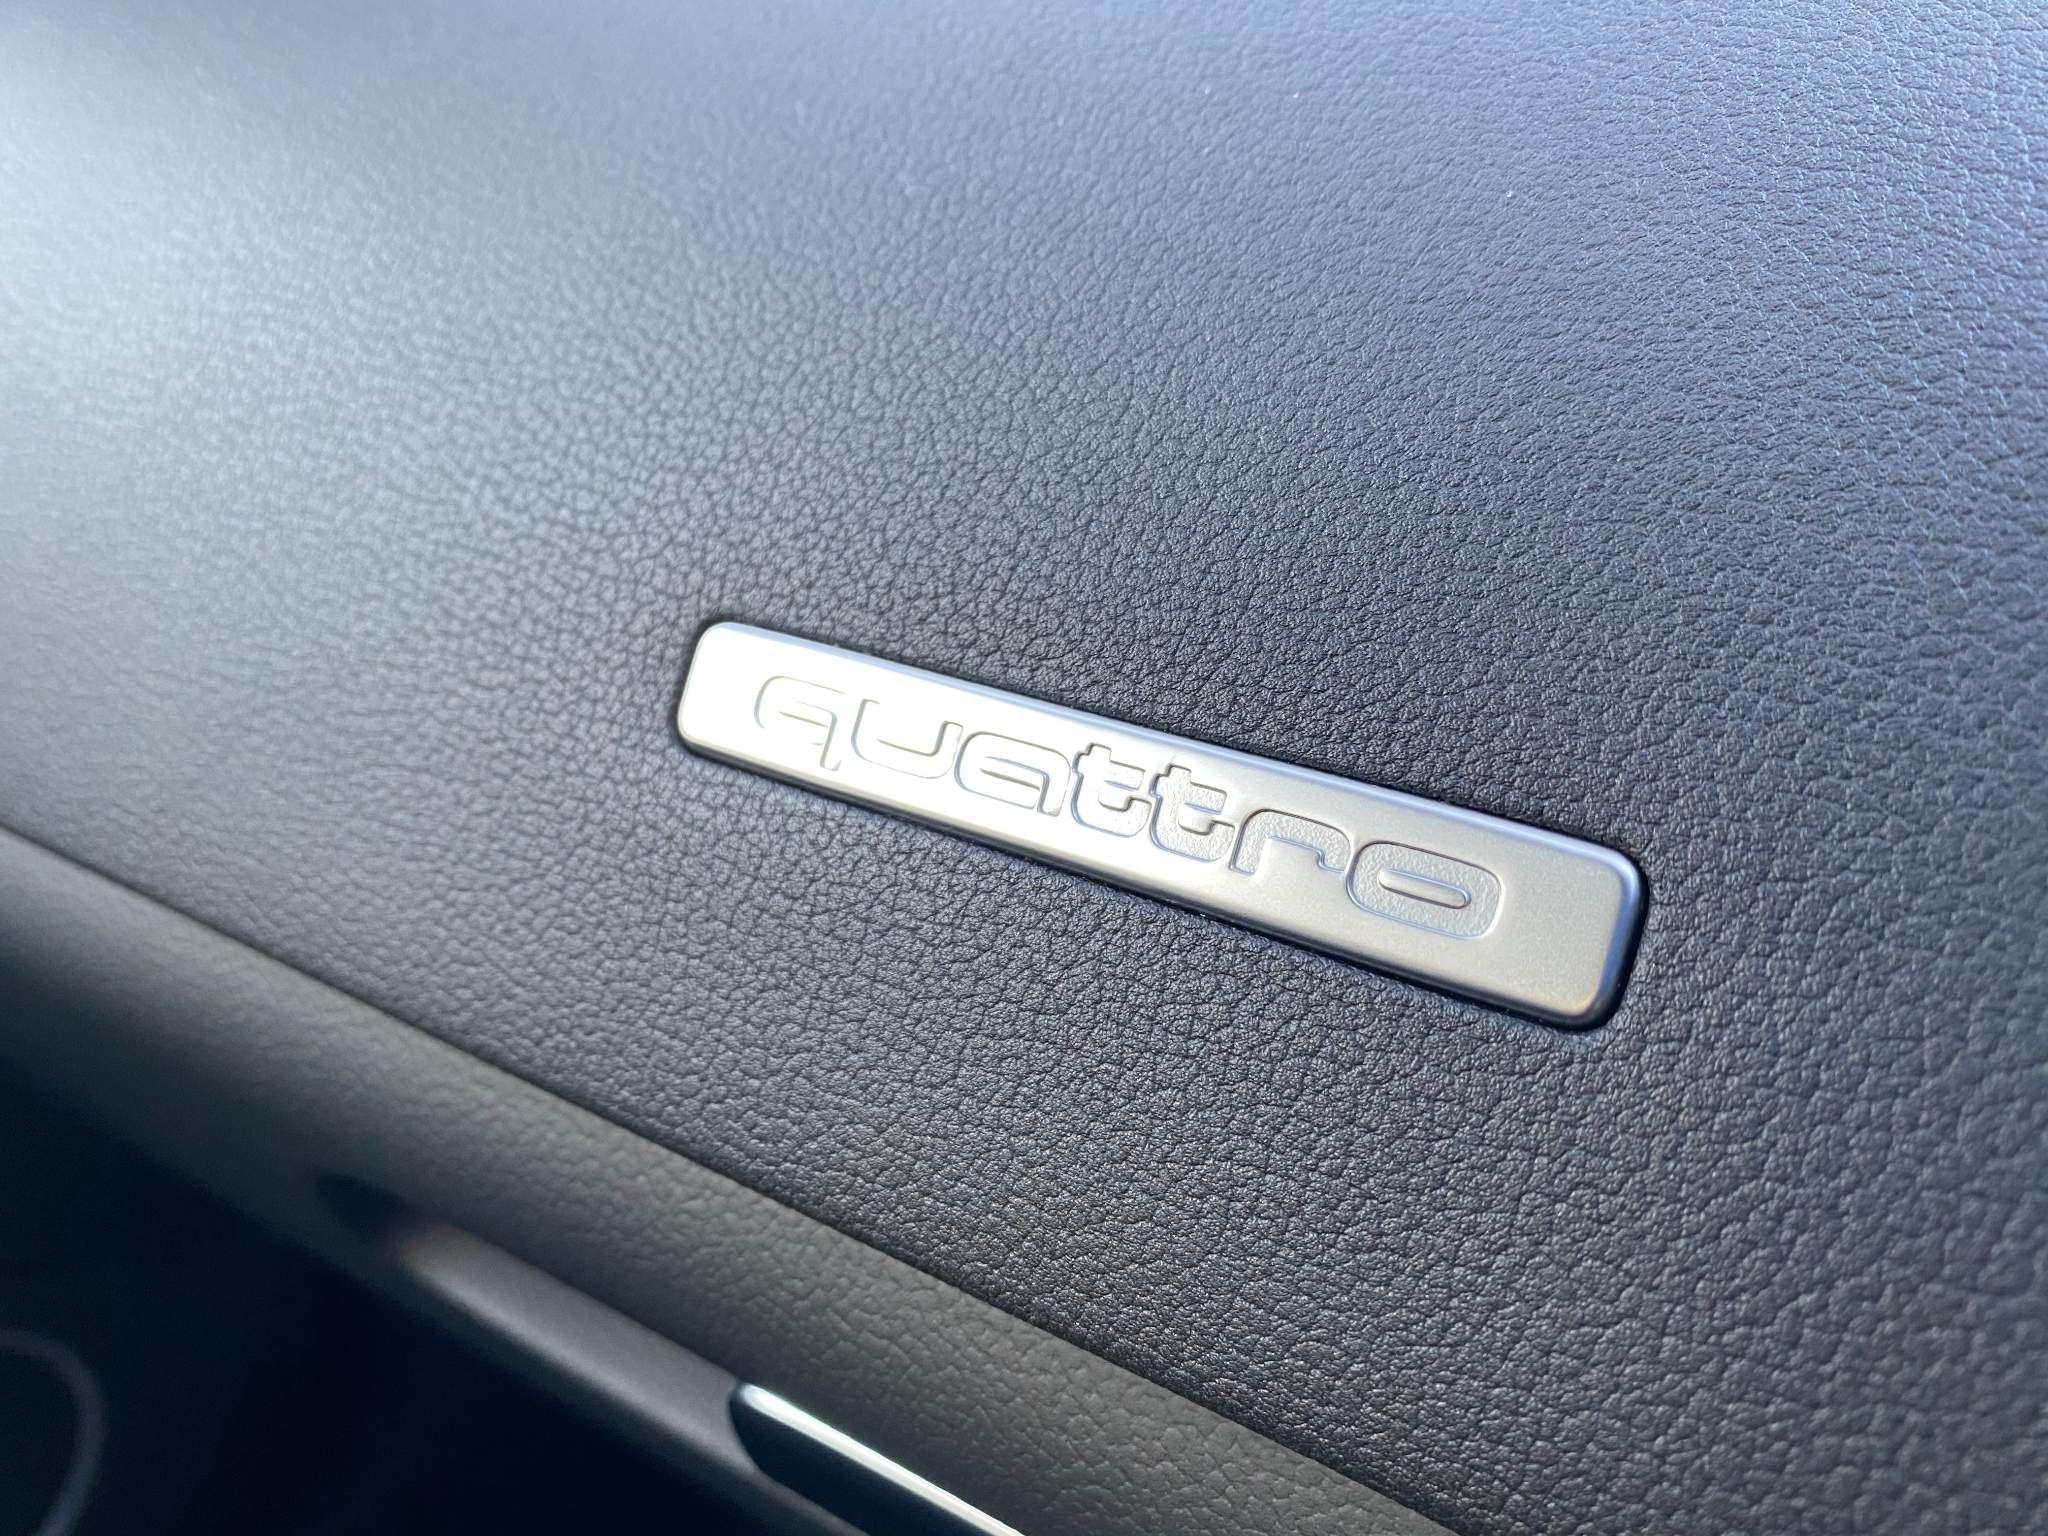 2015 Audi A5 2.0 TDI Black Edition Plus S Tronic quattro 2dr Diesel Automatic – Moyway Motors Dungannon full